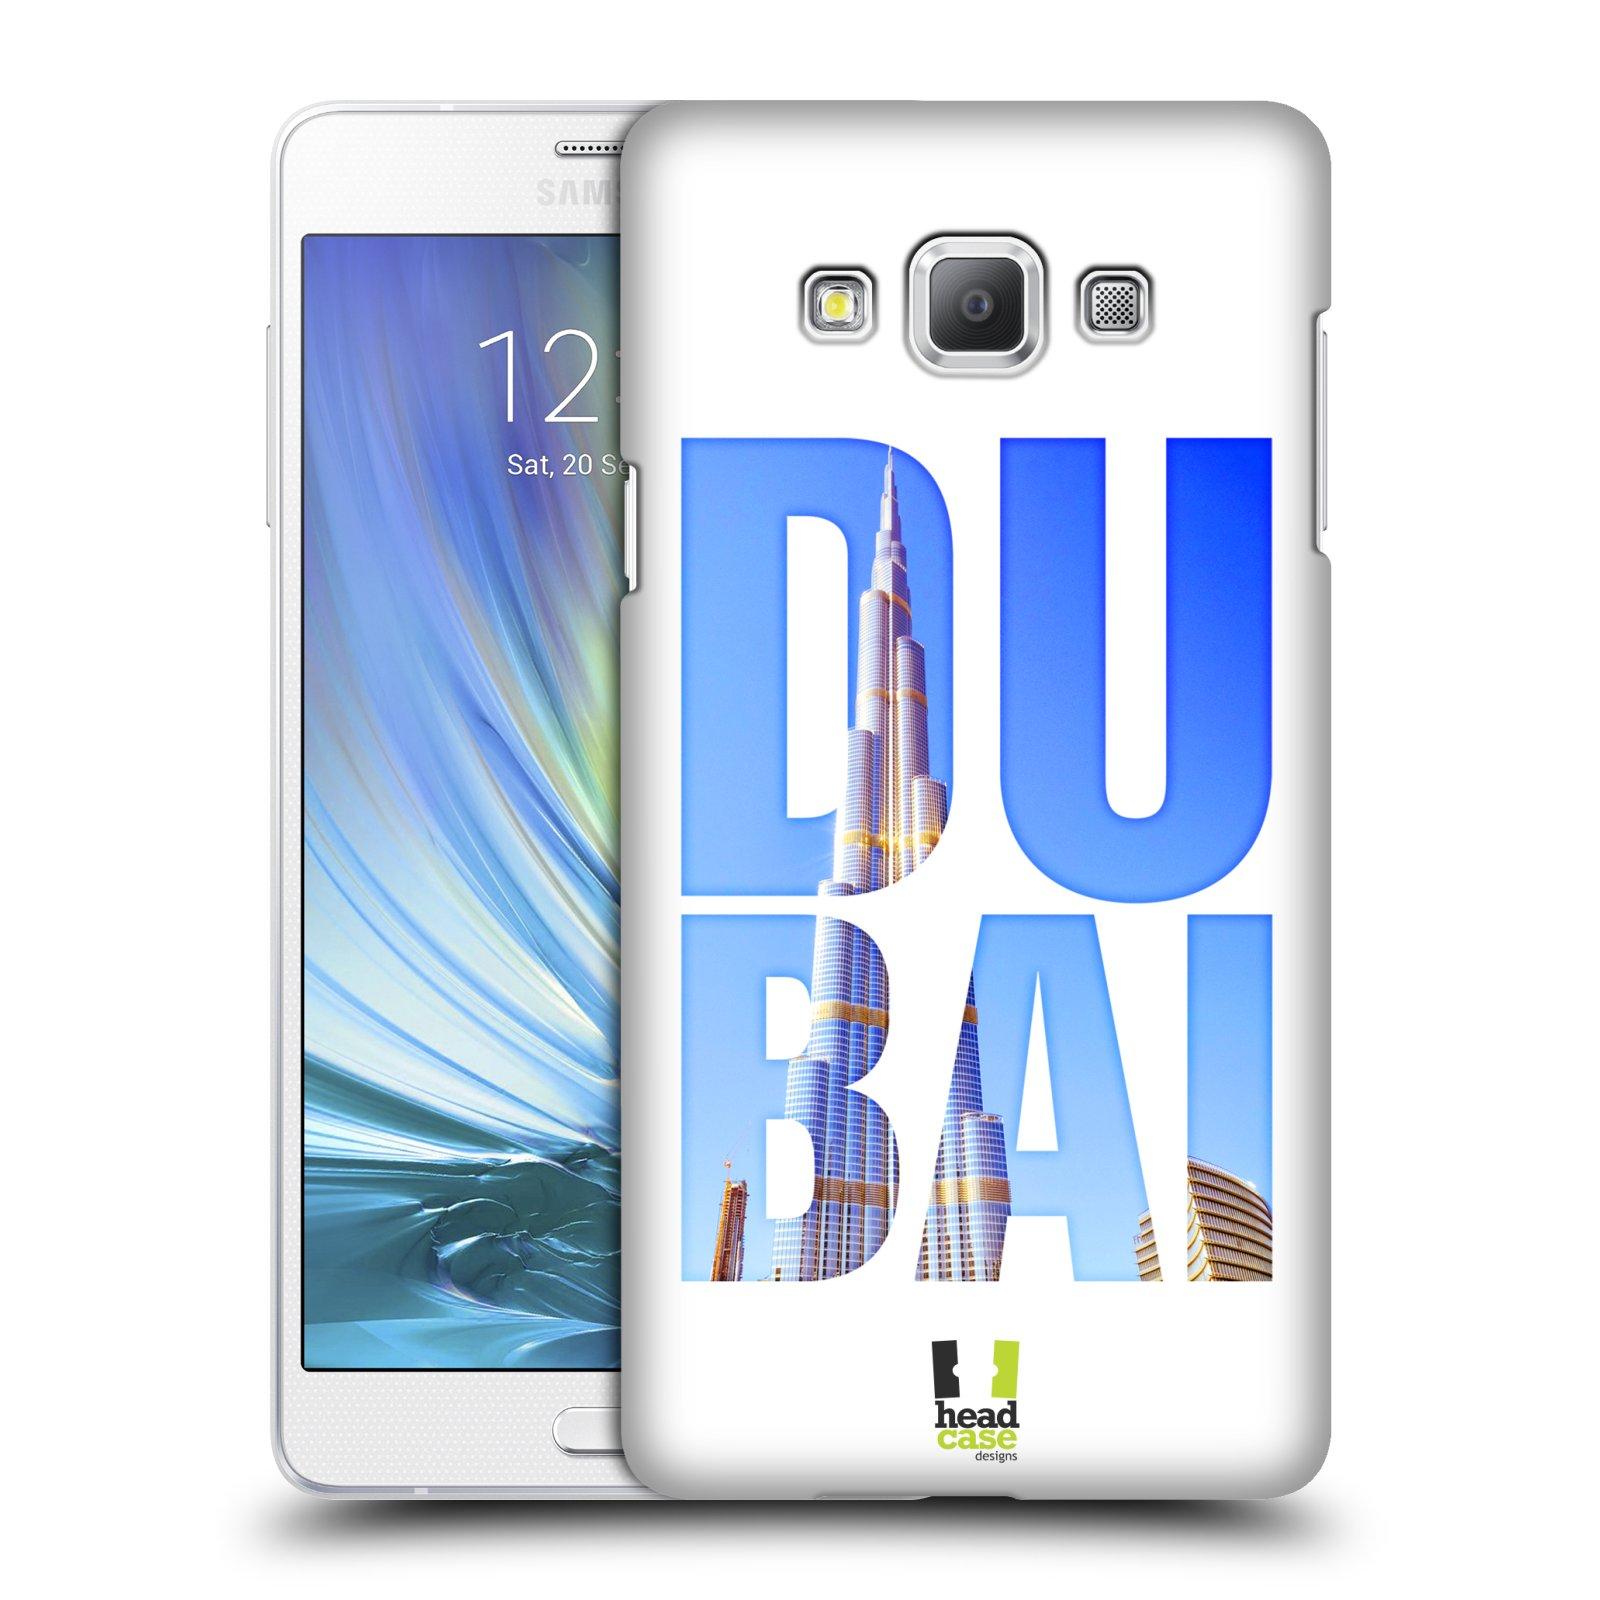 HEAD CASE plastový obal na mobil SAMSUNG GALAXY A7 vzor Města foto a nadpis ARABSKÉ EMIRÁTY, DUBAI, BURJ KHALIFA